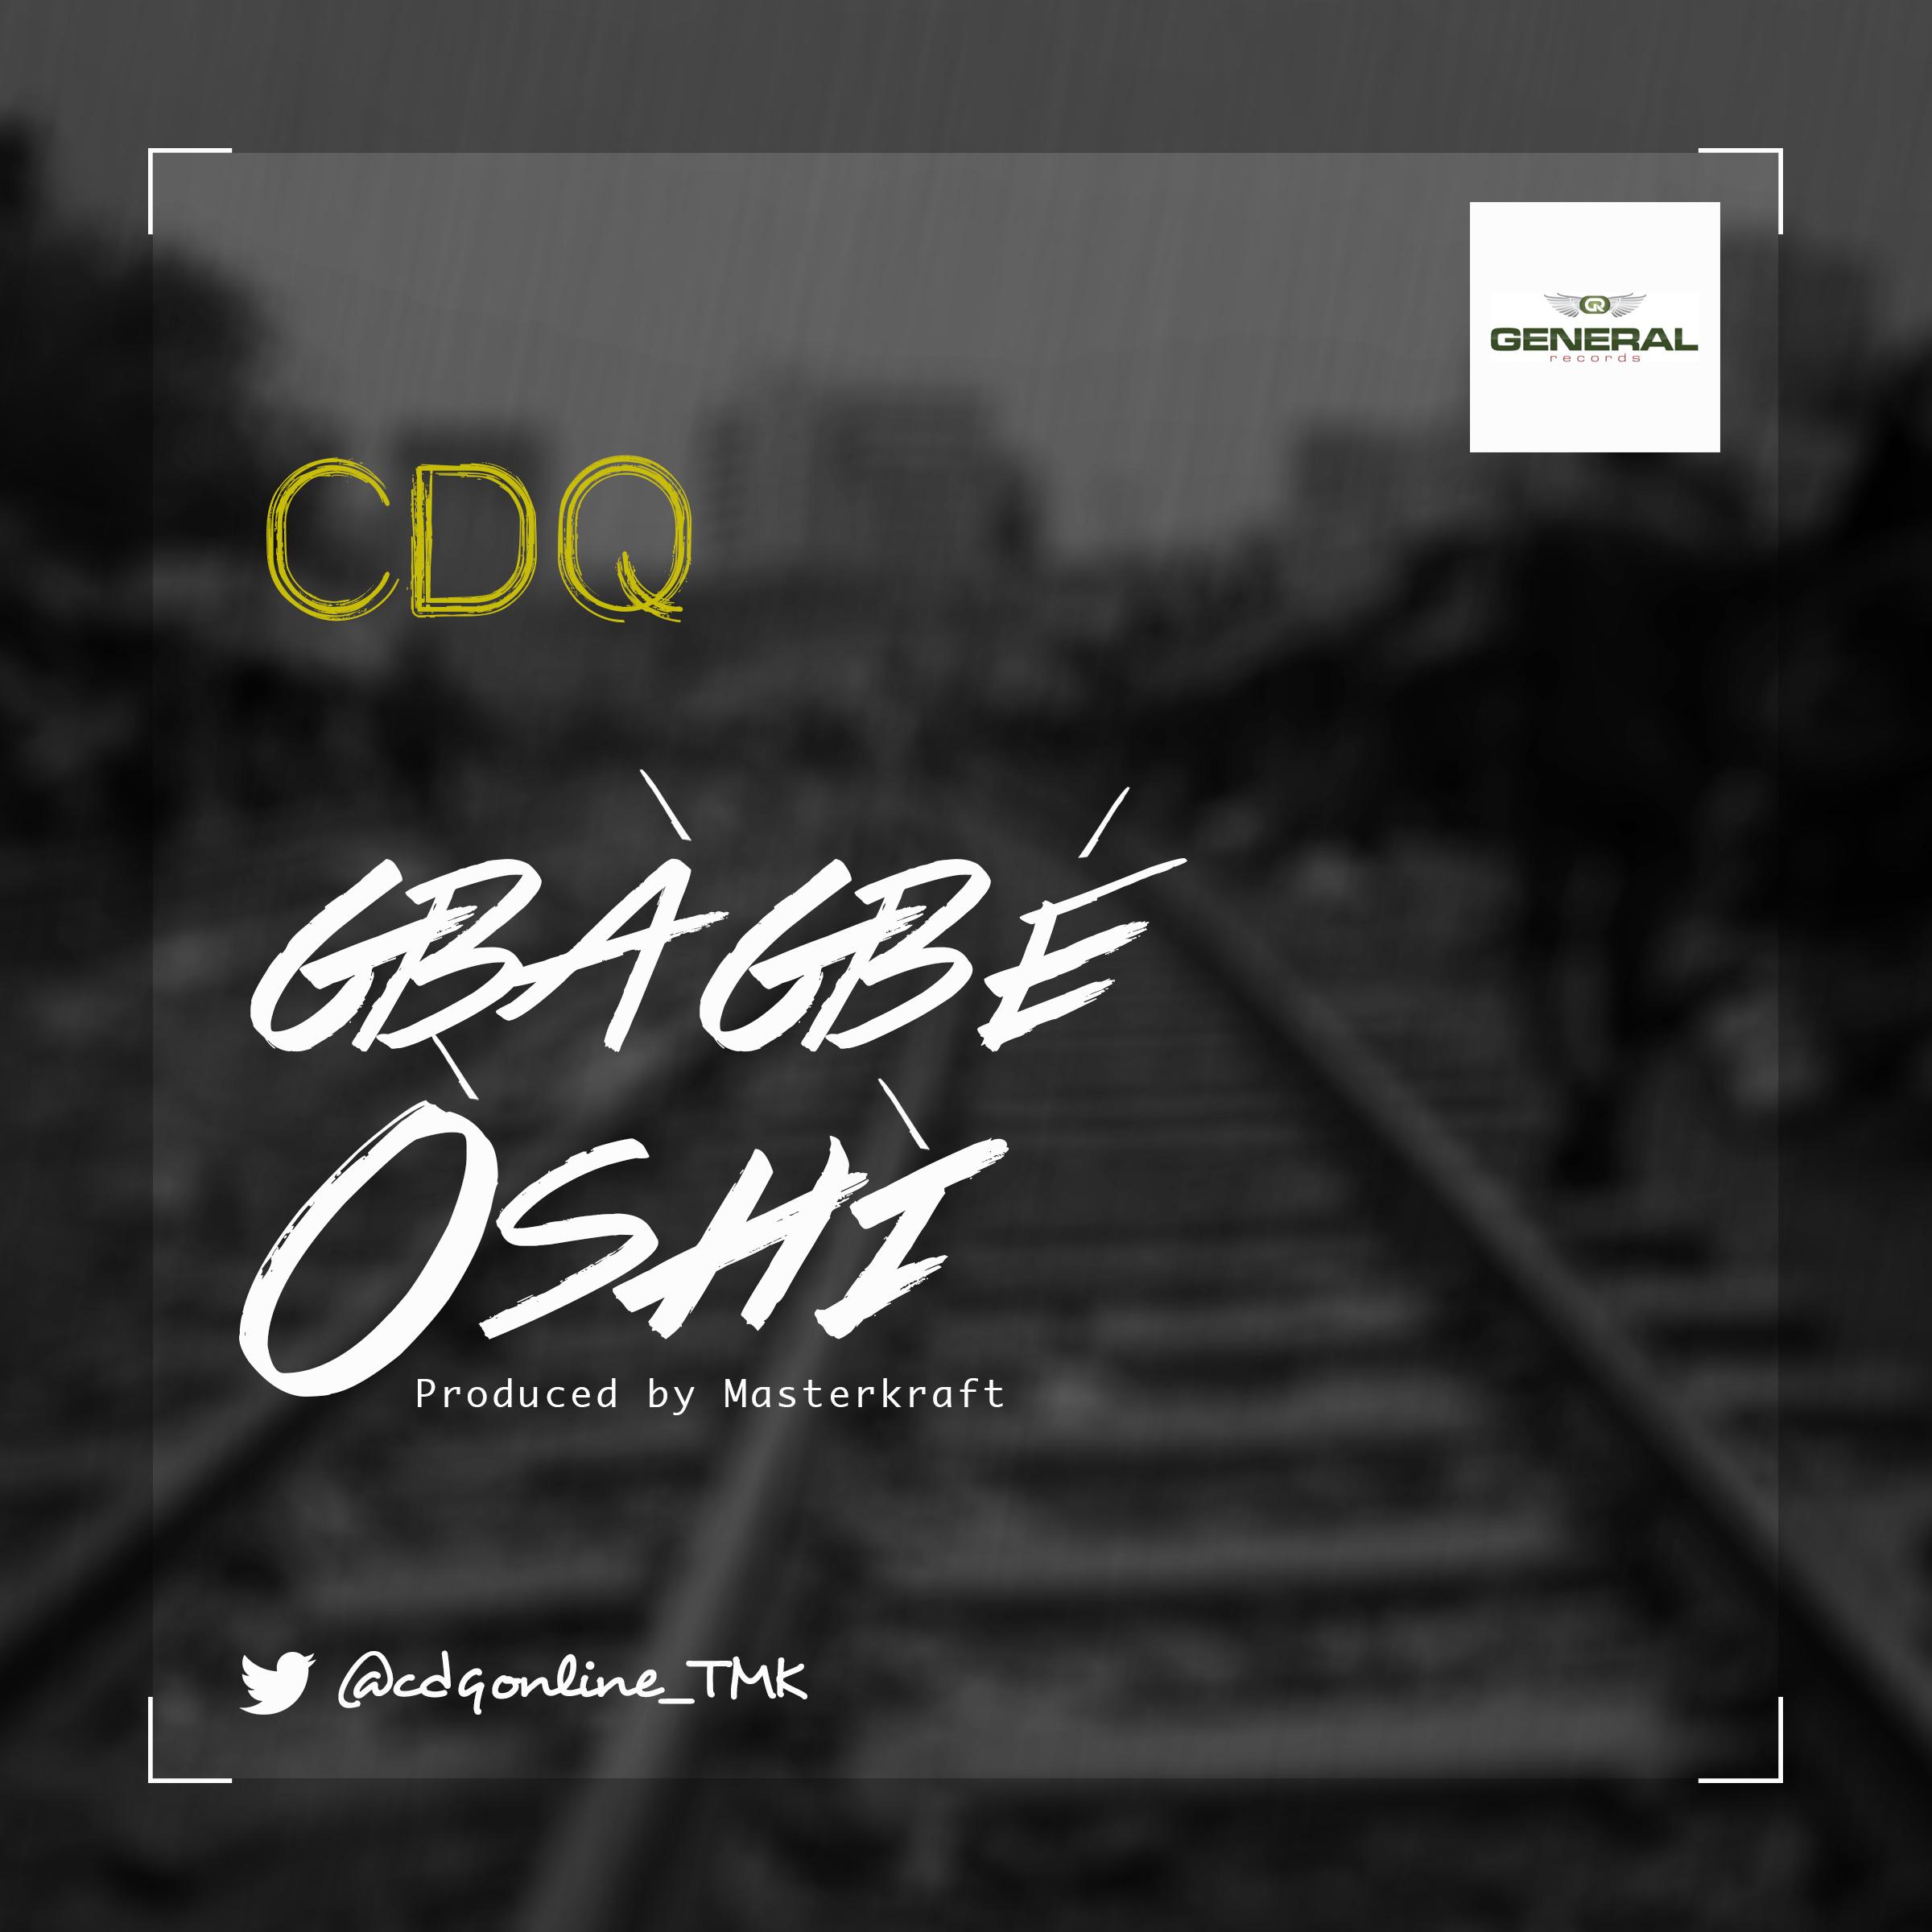 CDQ Gba Gba Oshi Art